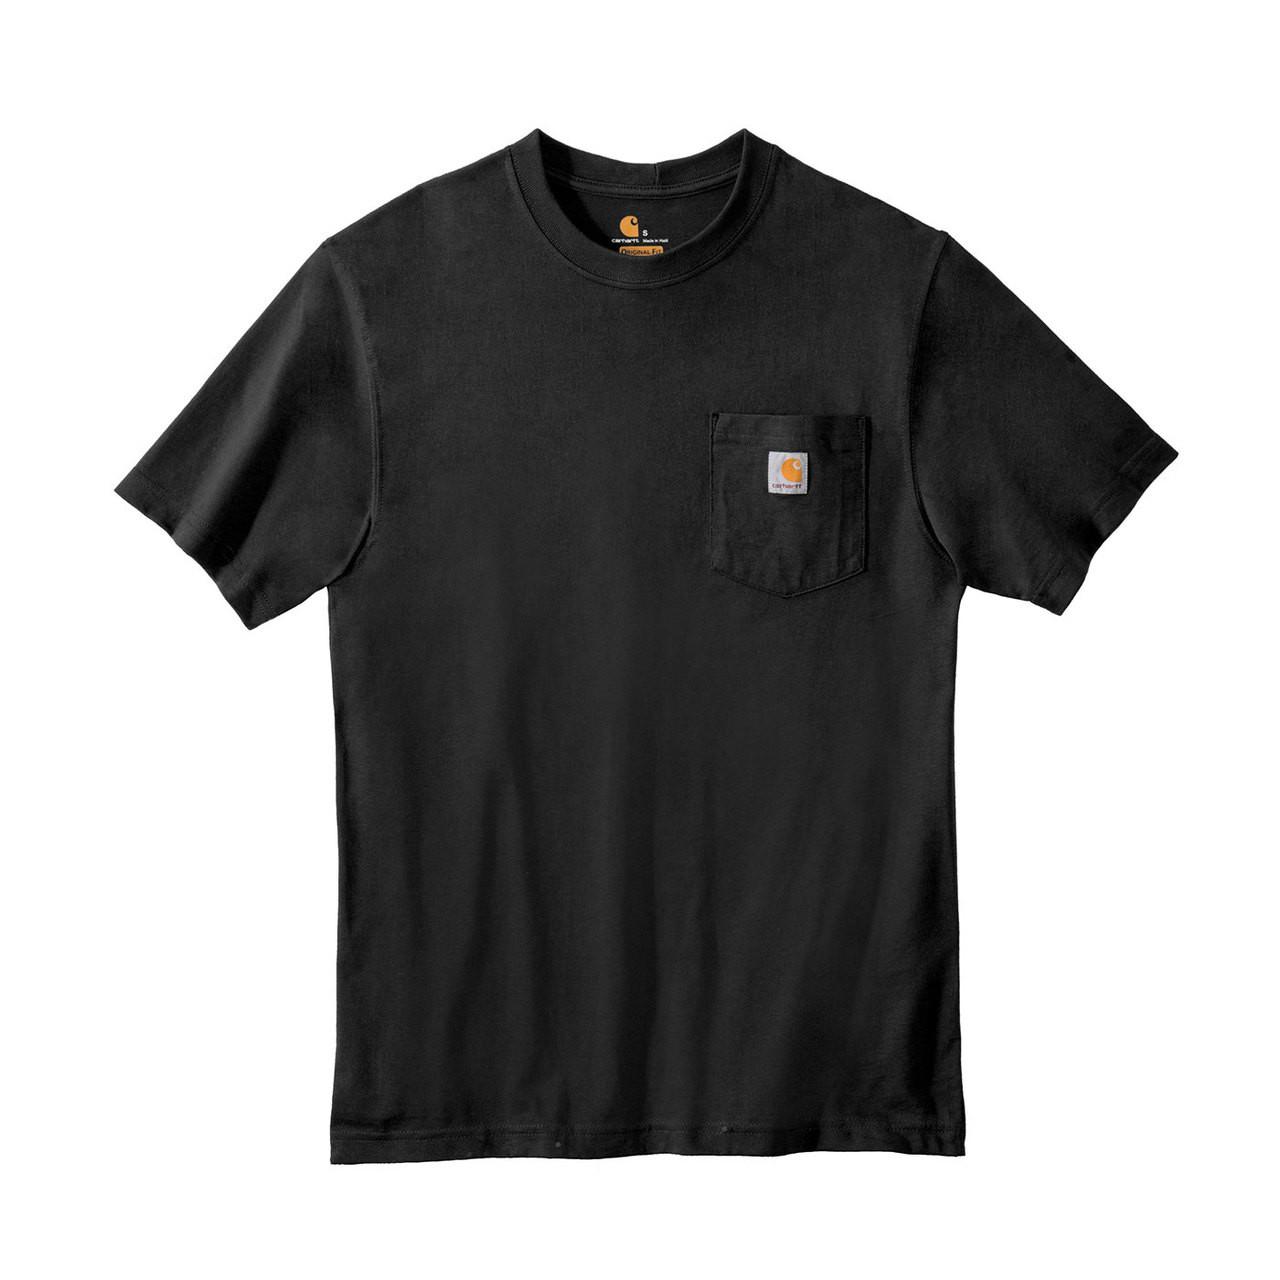 wholesale sales the best the latest Carhartt Workwear Pocket T Shirt K87